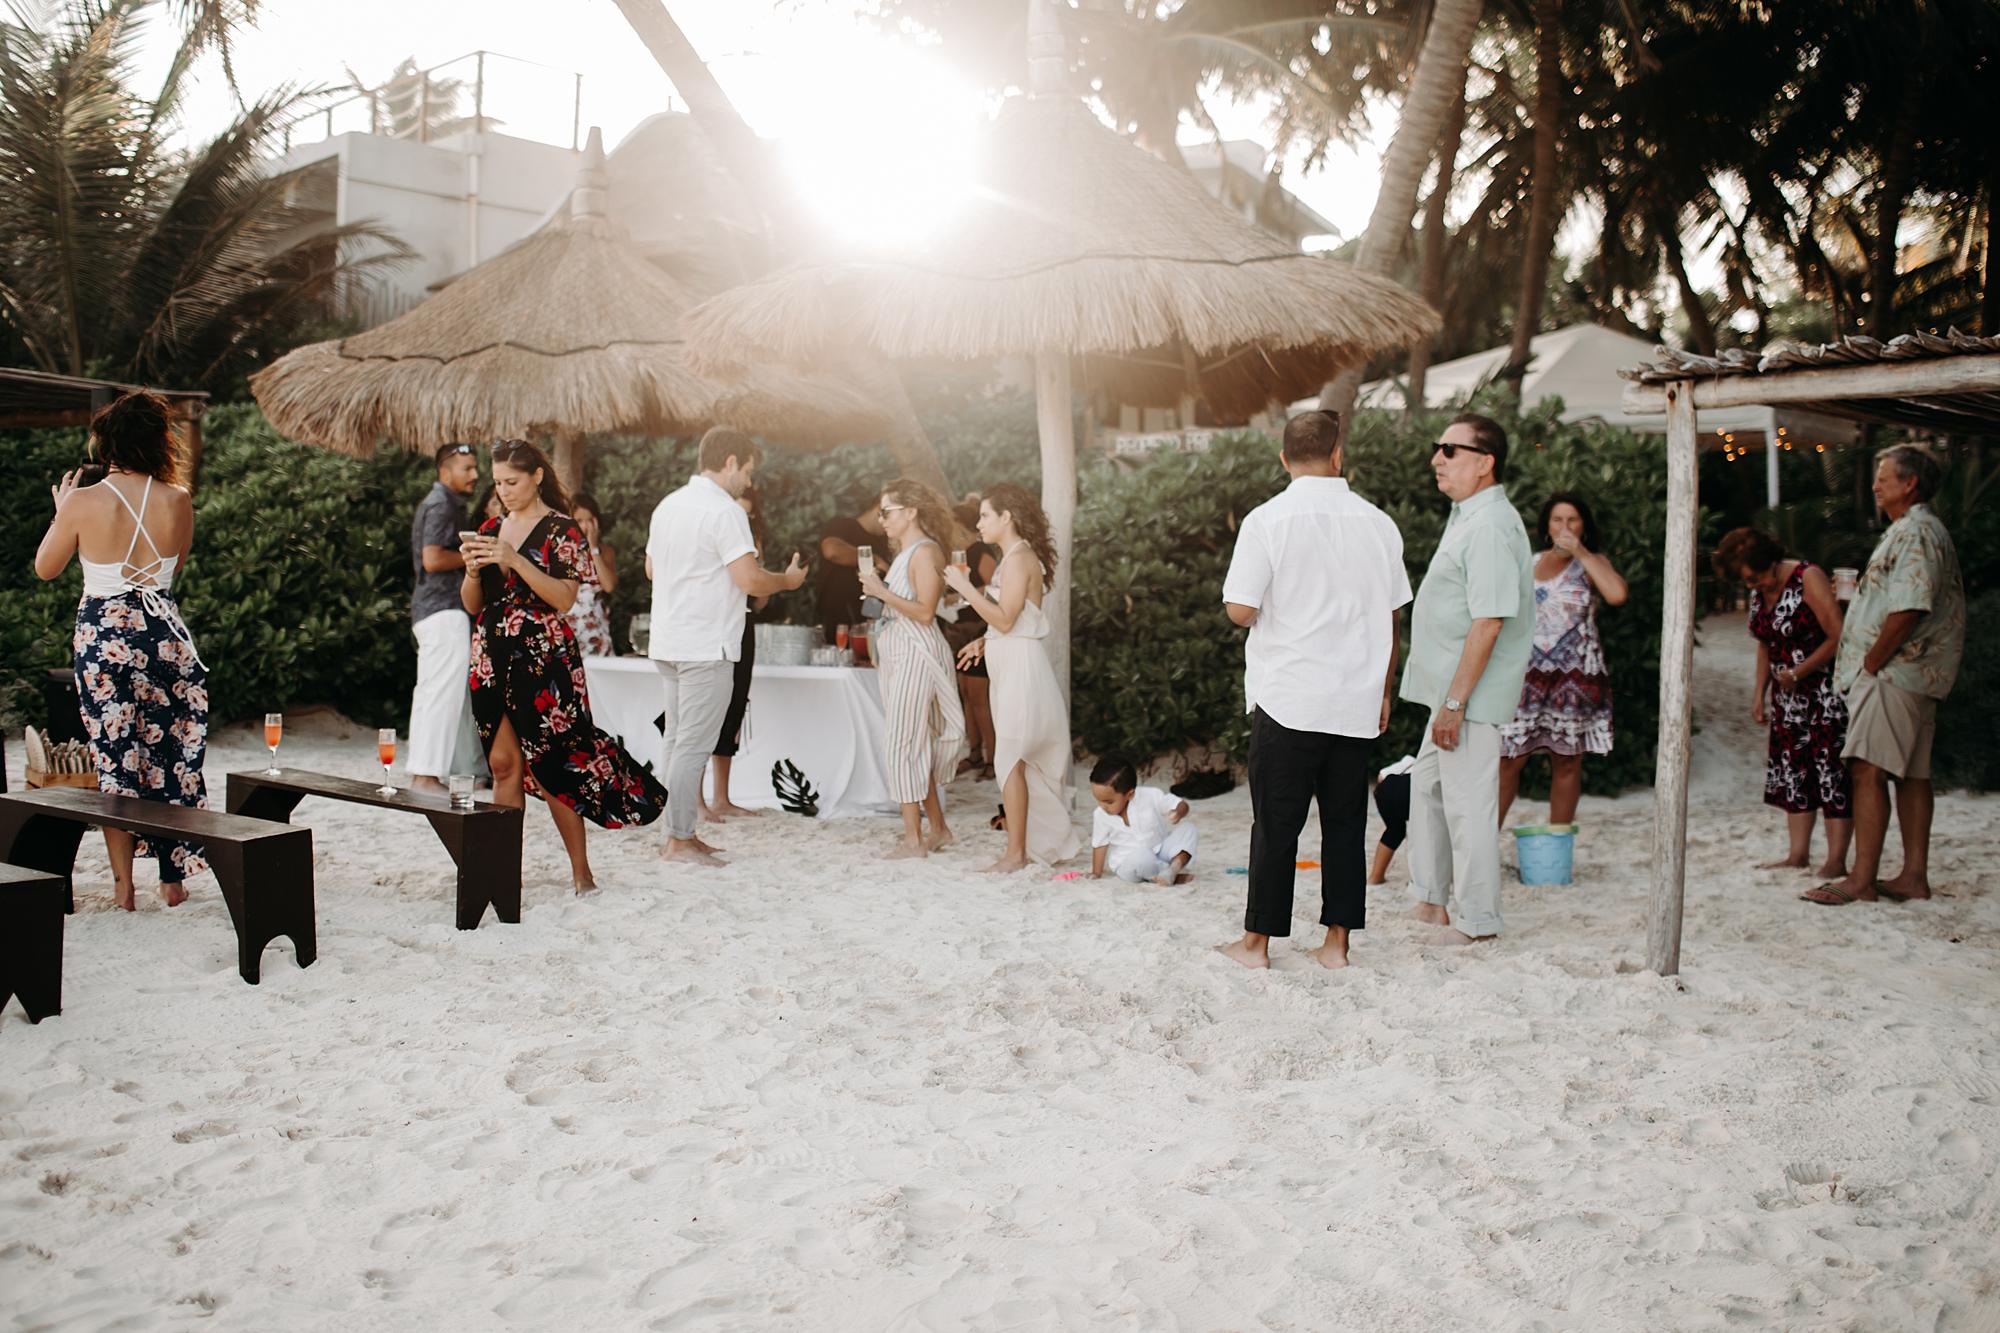 Danielle-San-Antonio-Wedding-Photographer-127_WEB.jpg